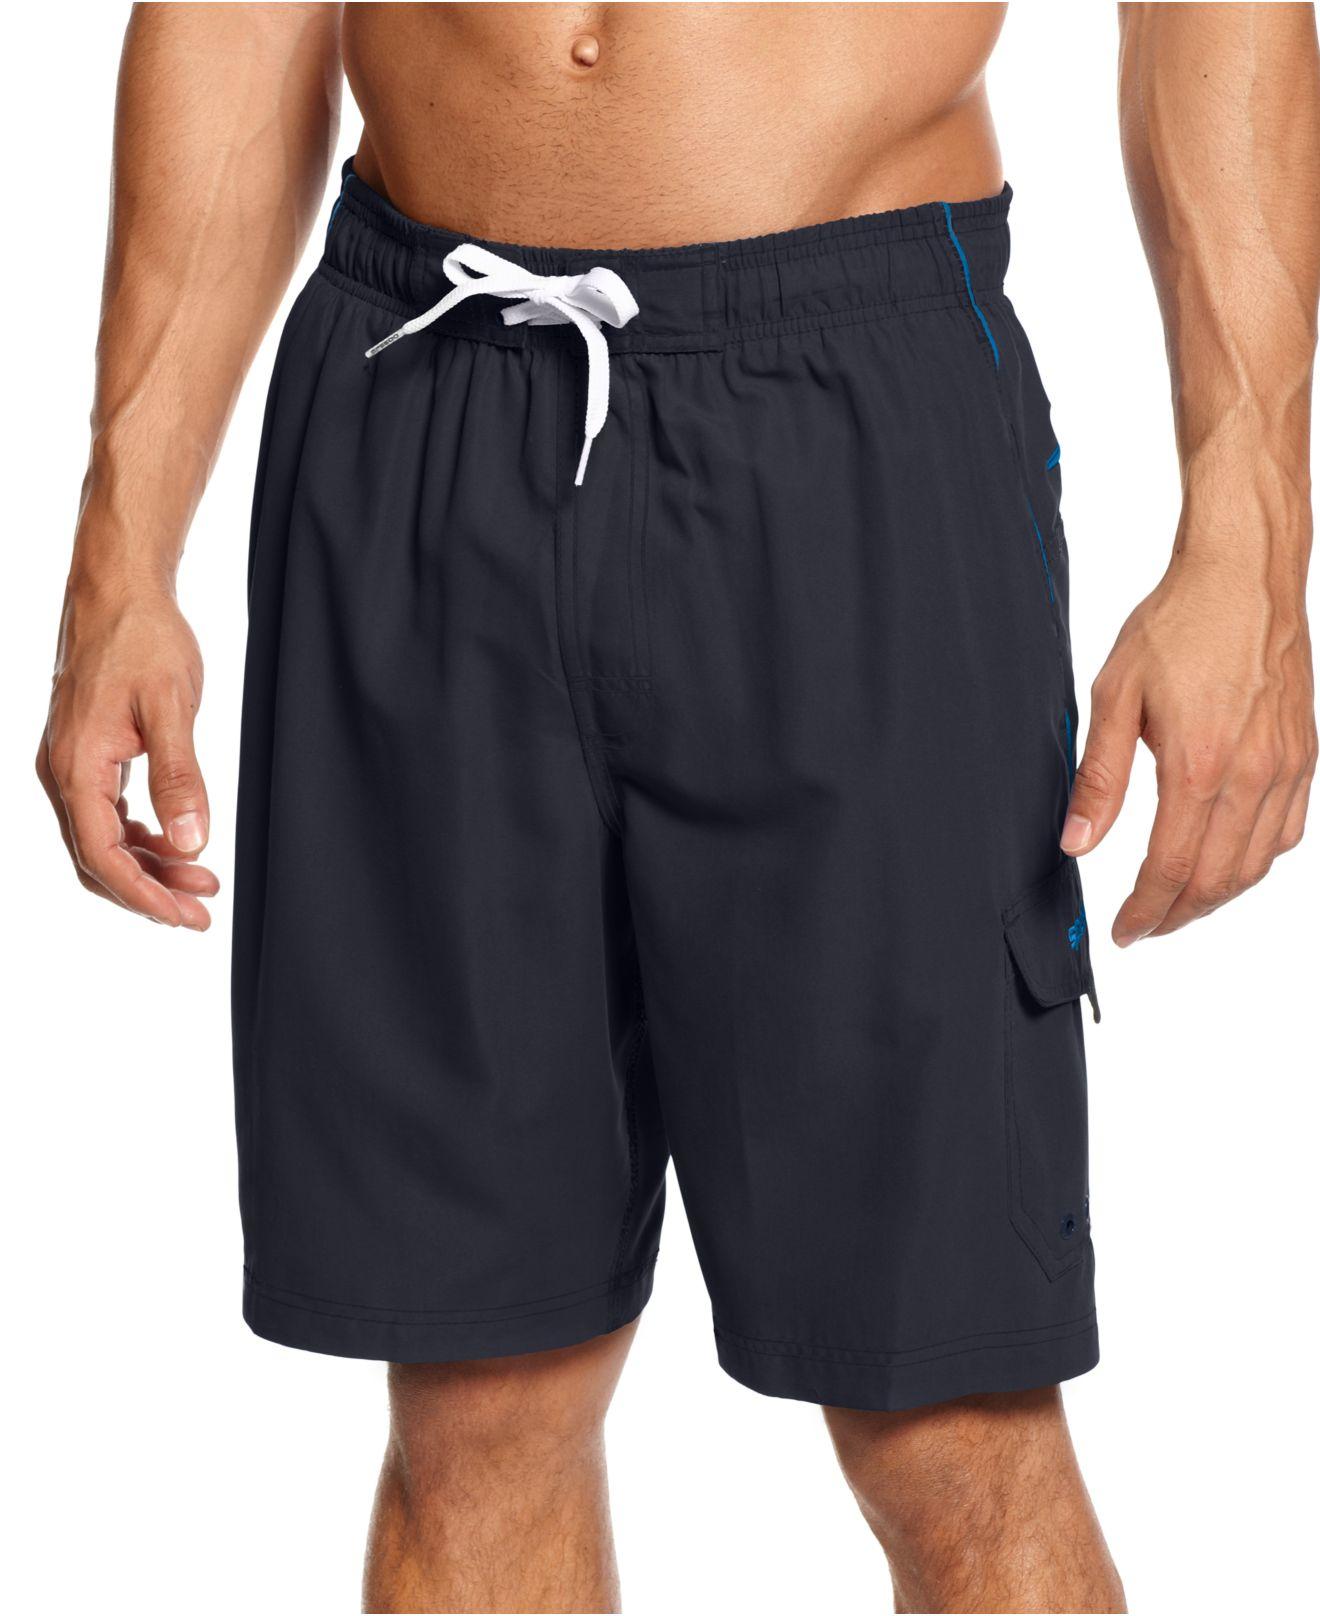 Speedo Swimwear Marina Swim Trunks In Black For Men Lyst